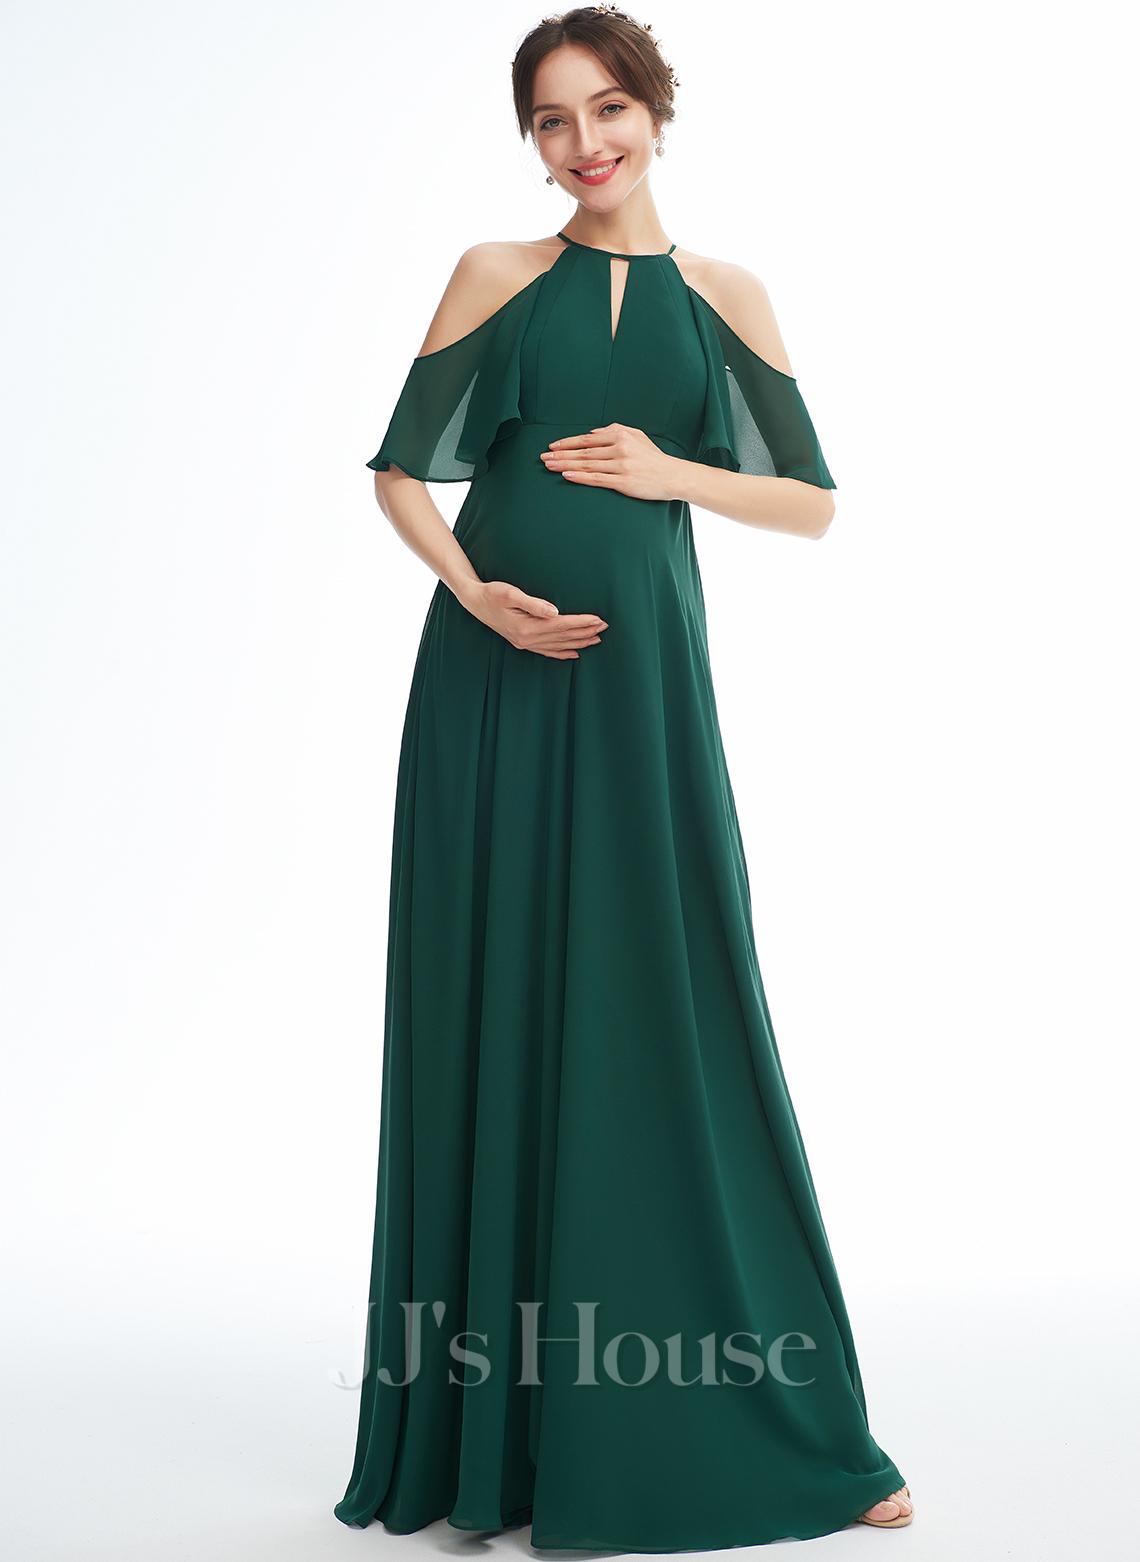 A-line Halter Floor-length Chiffon Maternity Bridesmaid Dress With Ruffle